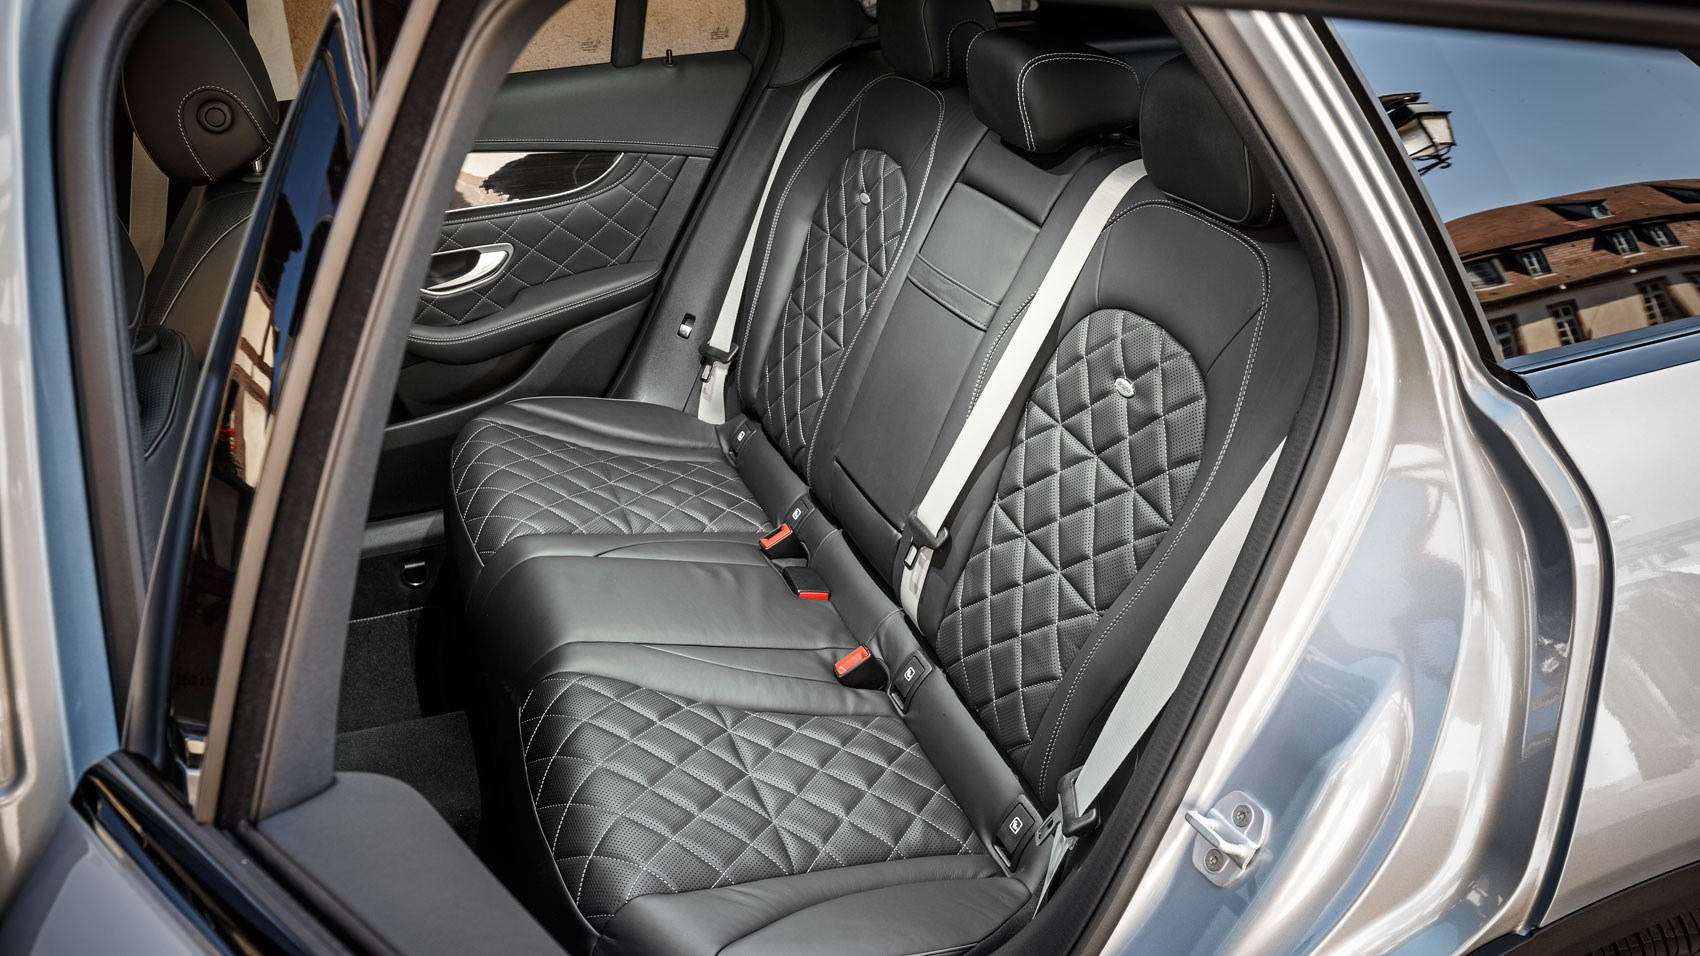 Mercedes Benz Glc250d 2015 Review Car Magazine